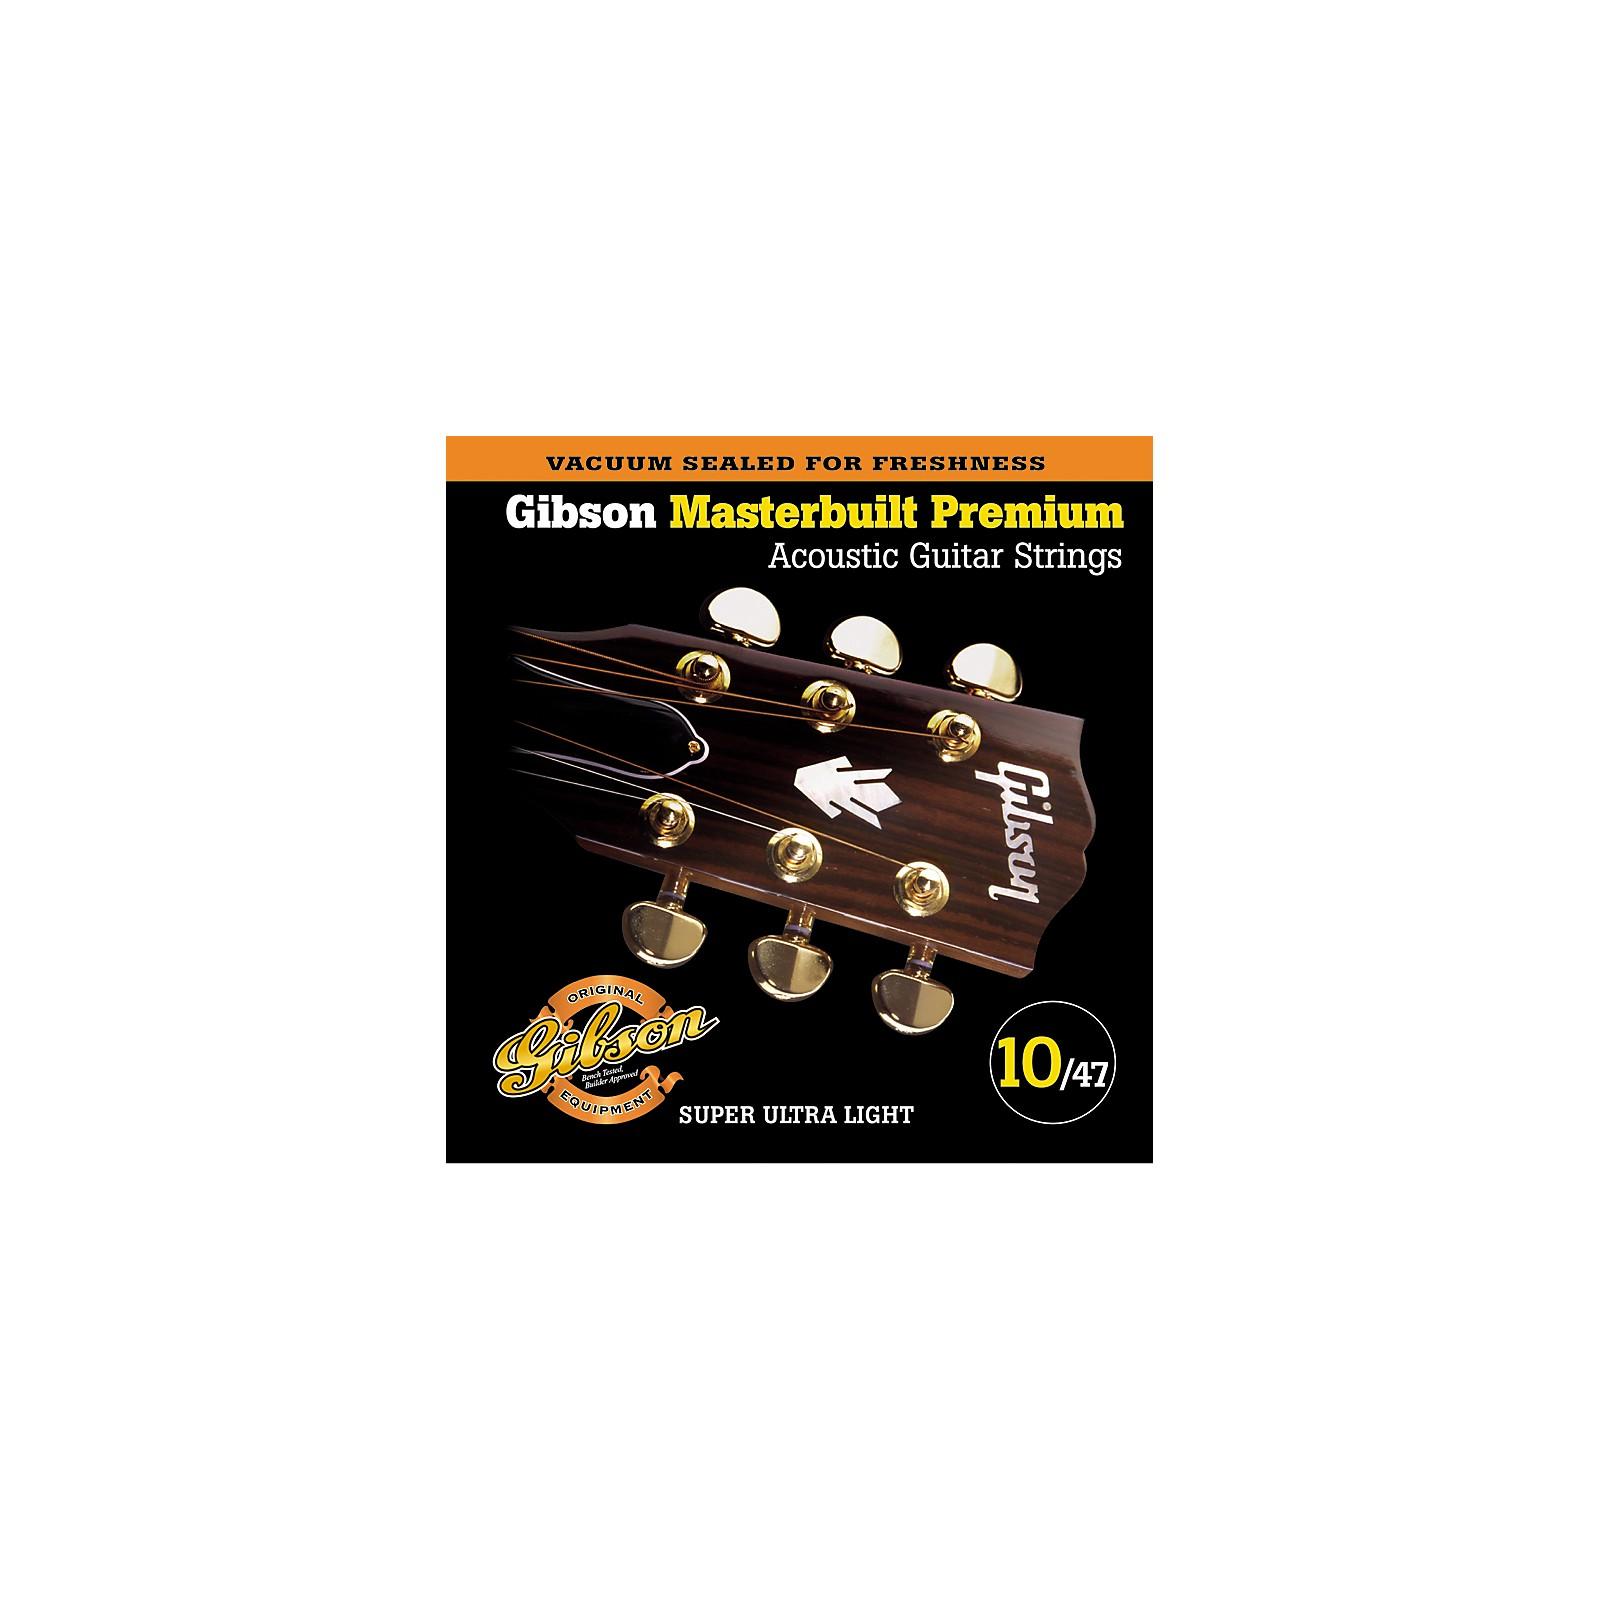 Gibson SAG-MB10 Masterbuilt Premium Phosphor Bronze Acoustic Strings